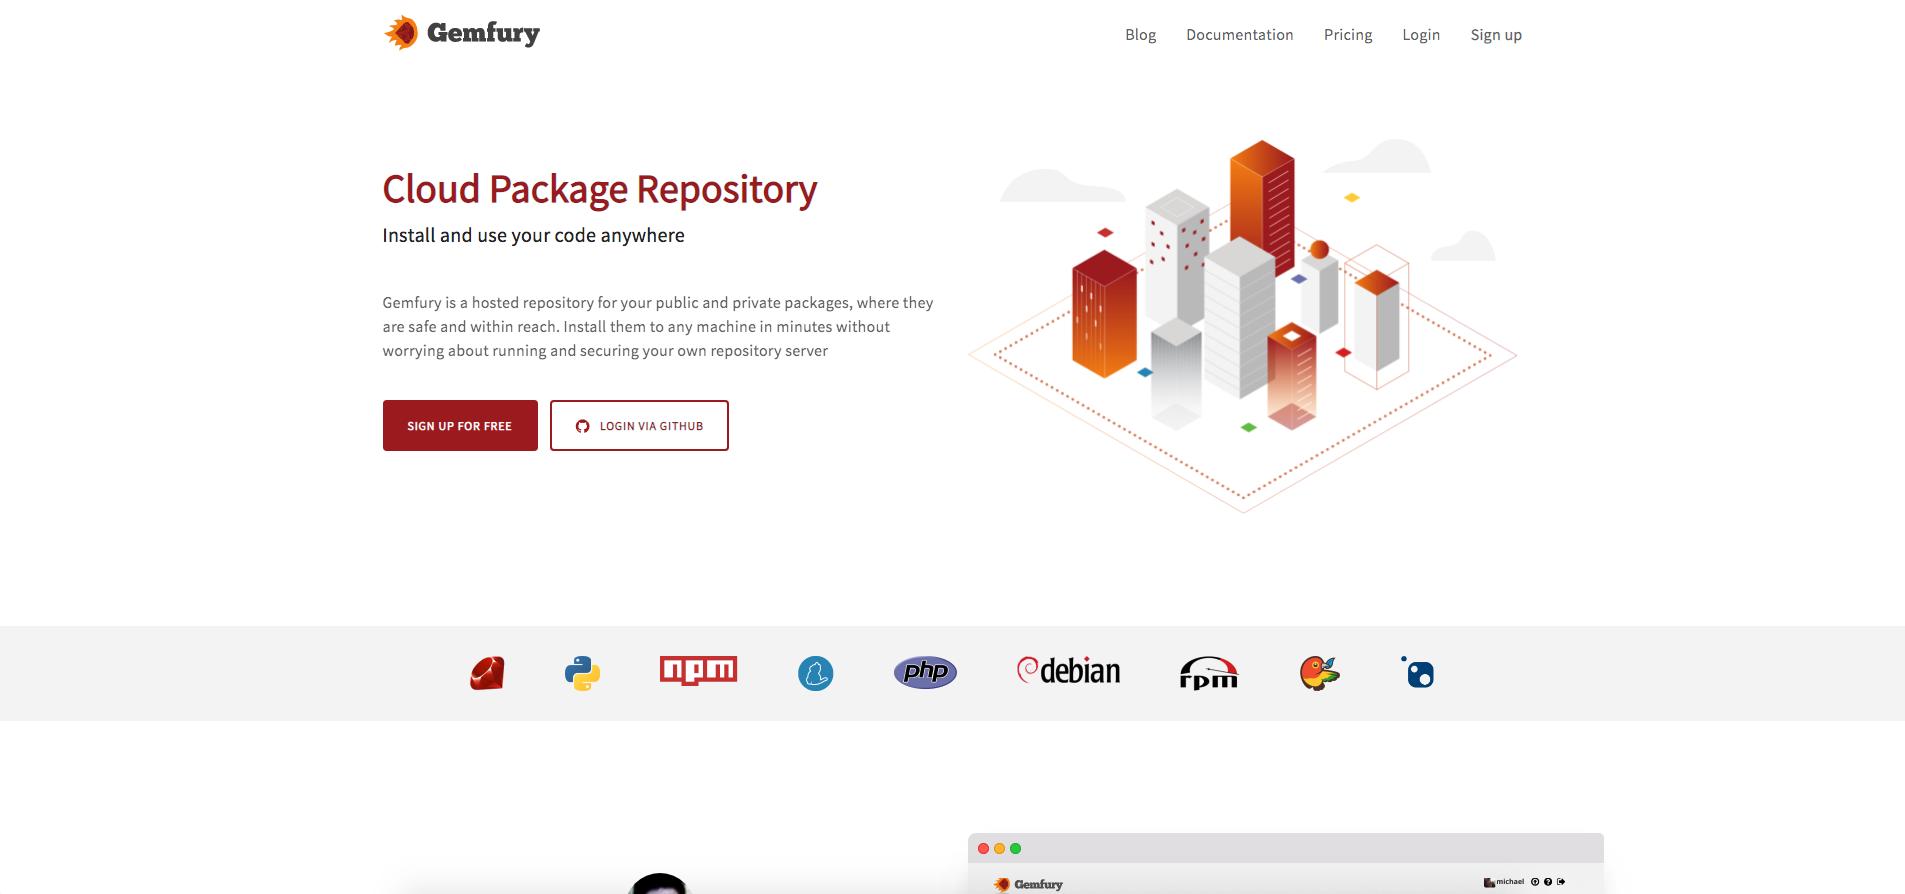 Symph - Mobile Apps, Web Design and Web Development | Work